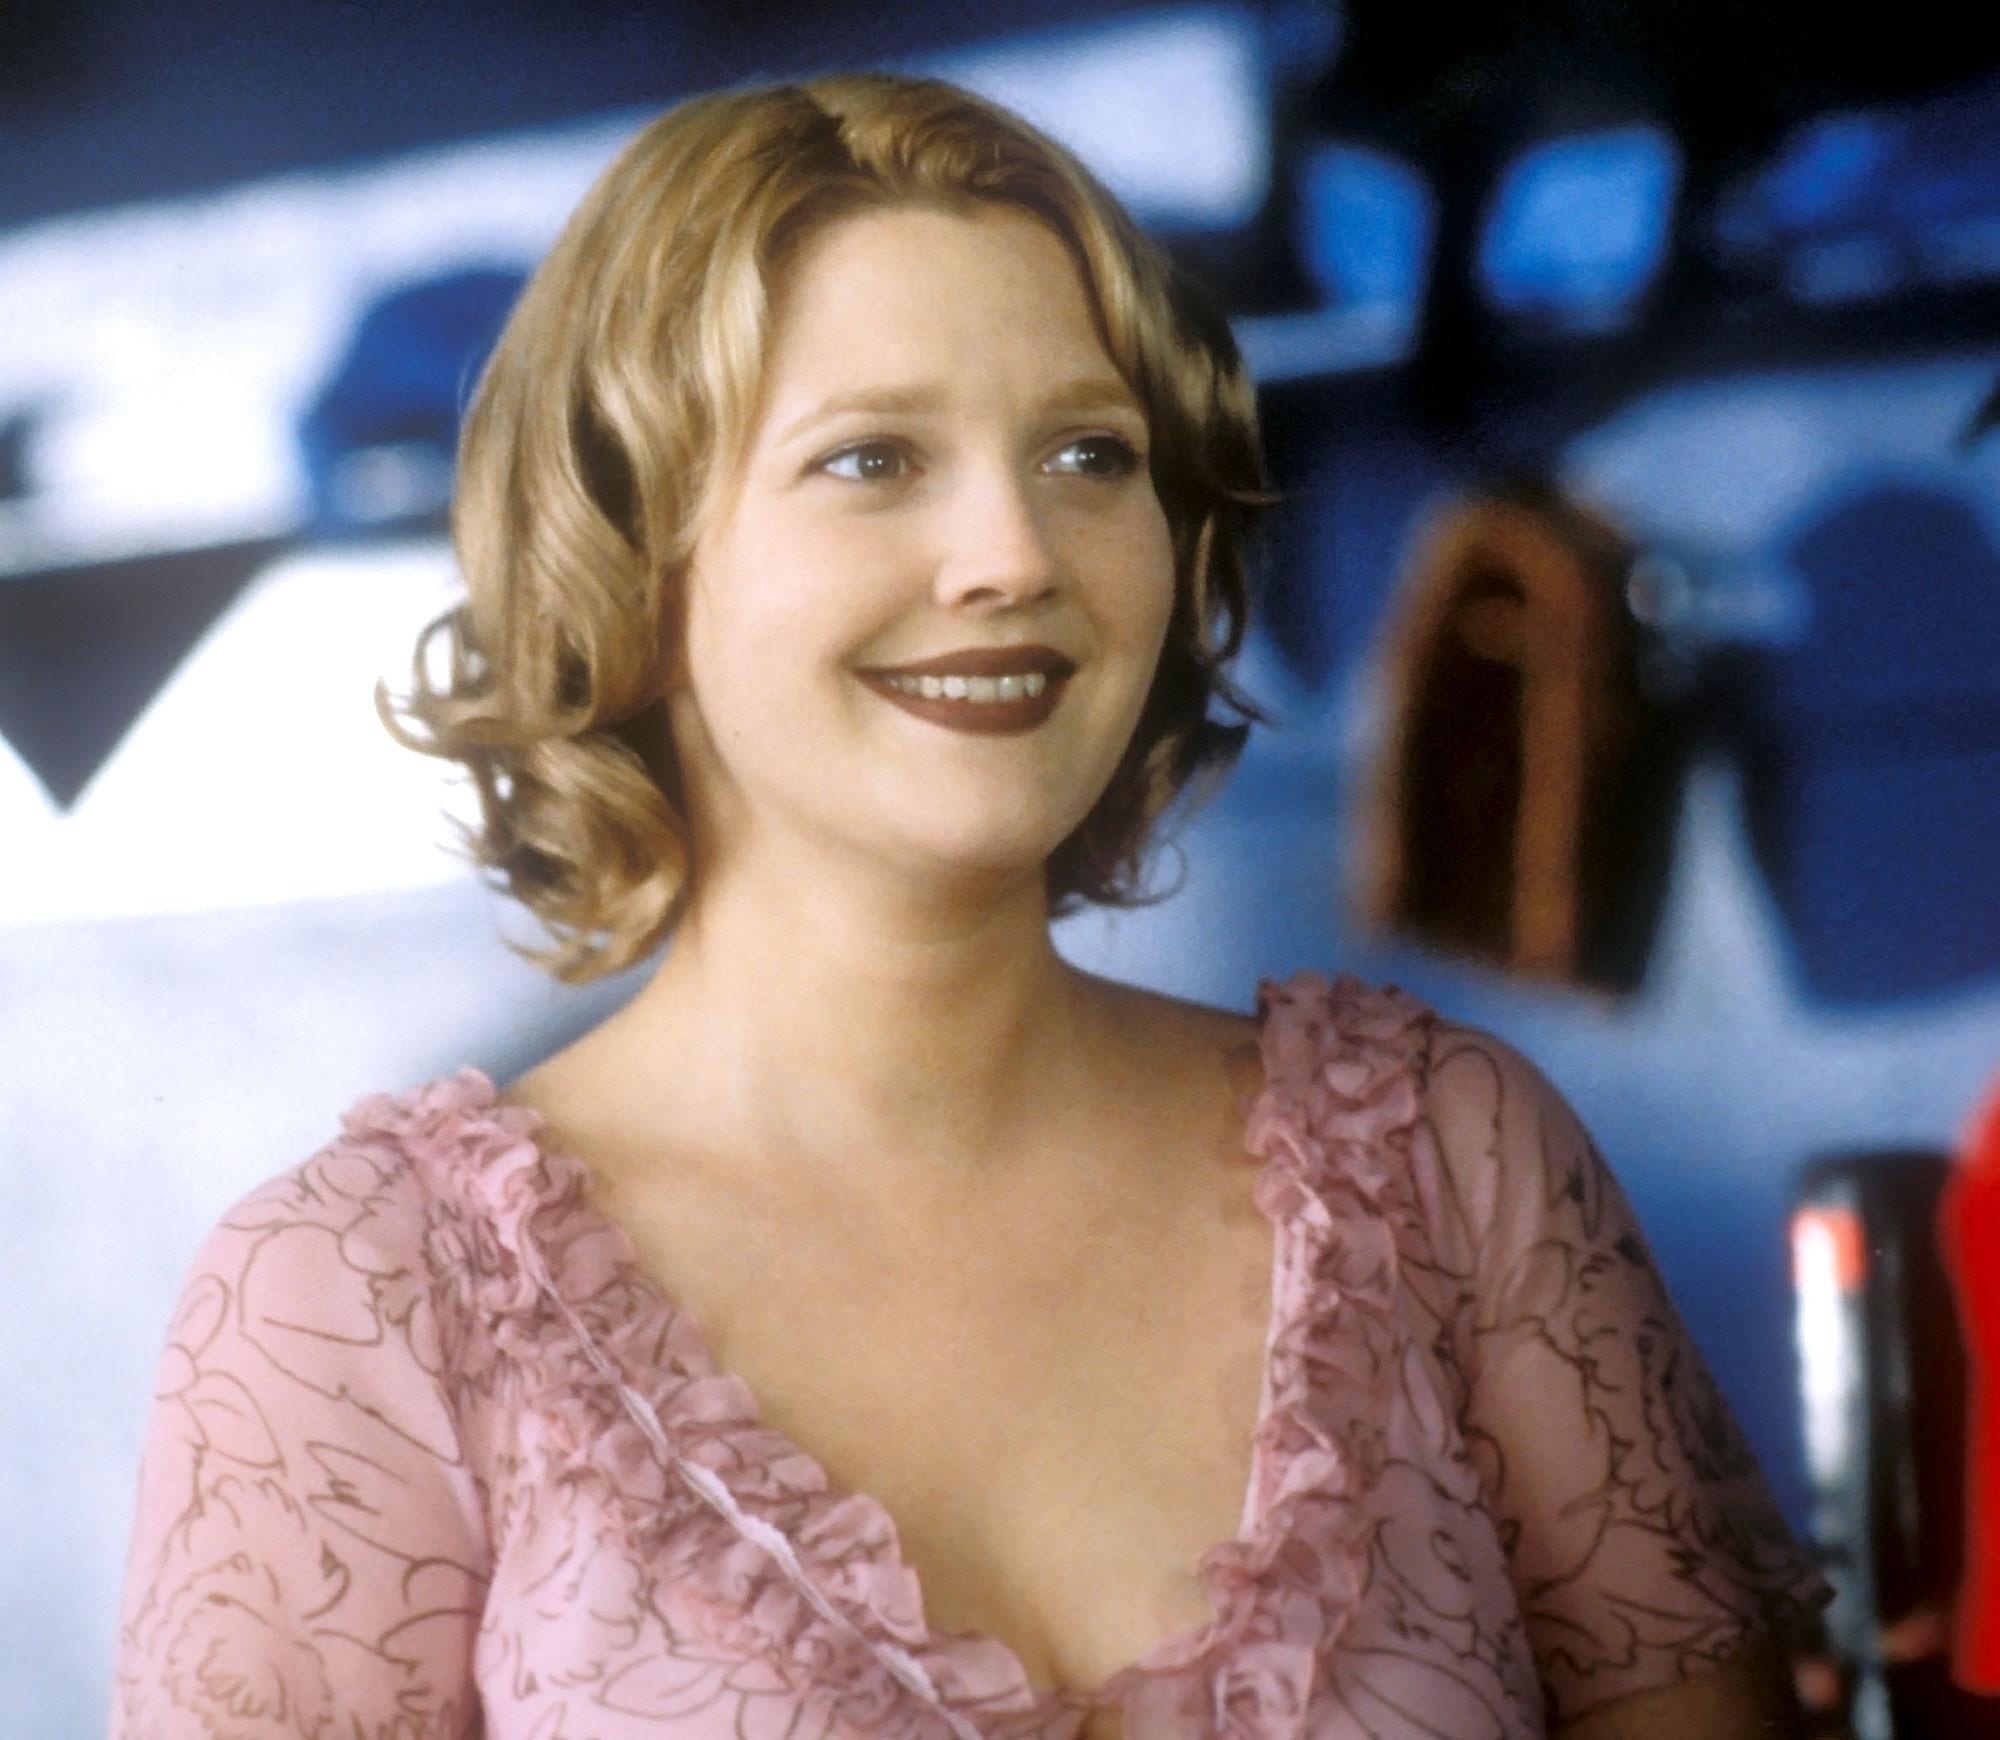 Drew Barrymore as Josie Grossie, More Stars Revisit Roles in Quarantine